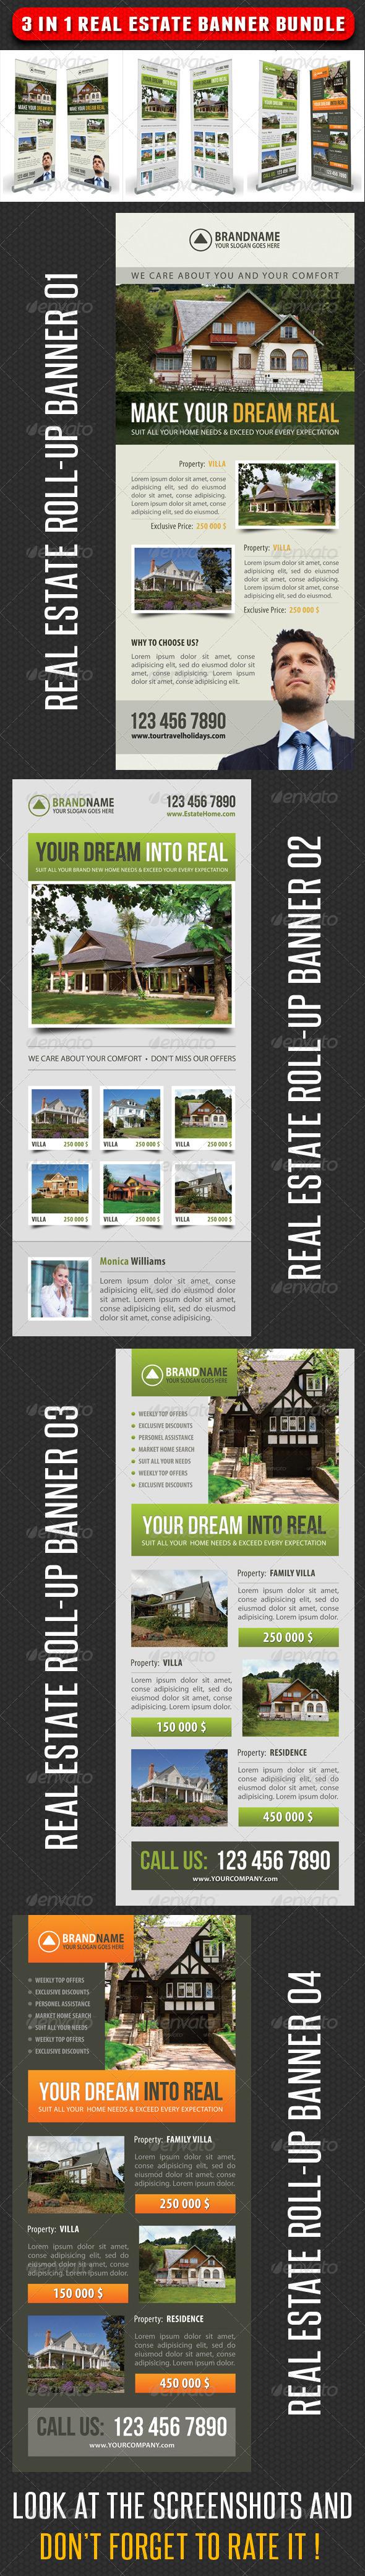 GraphicRiver 3 in 1 Real Estate Banner Bundle 03 7346257